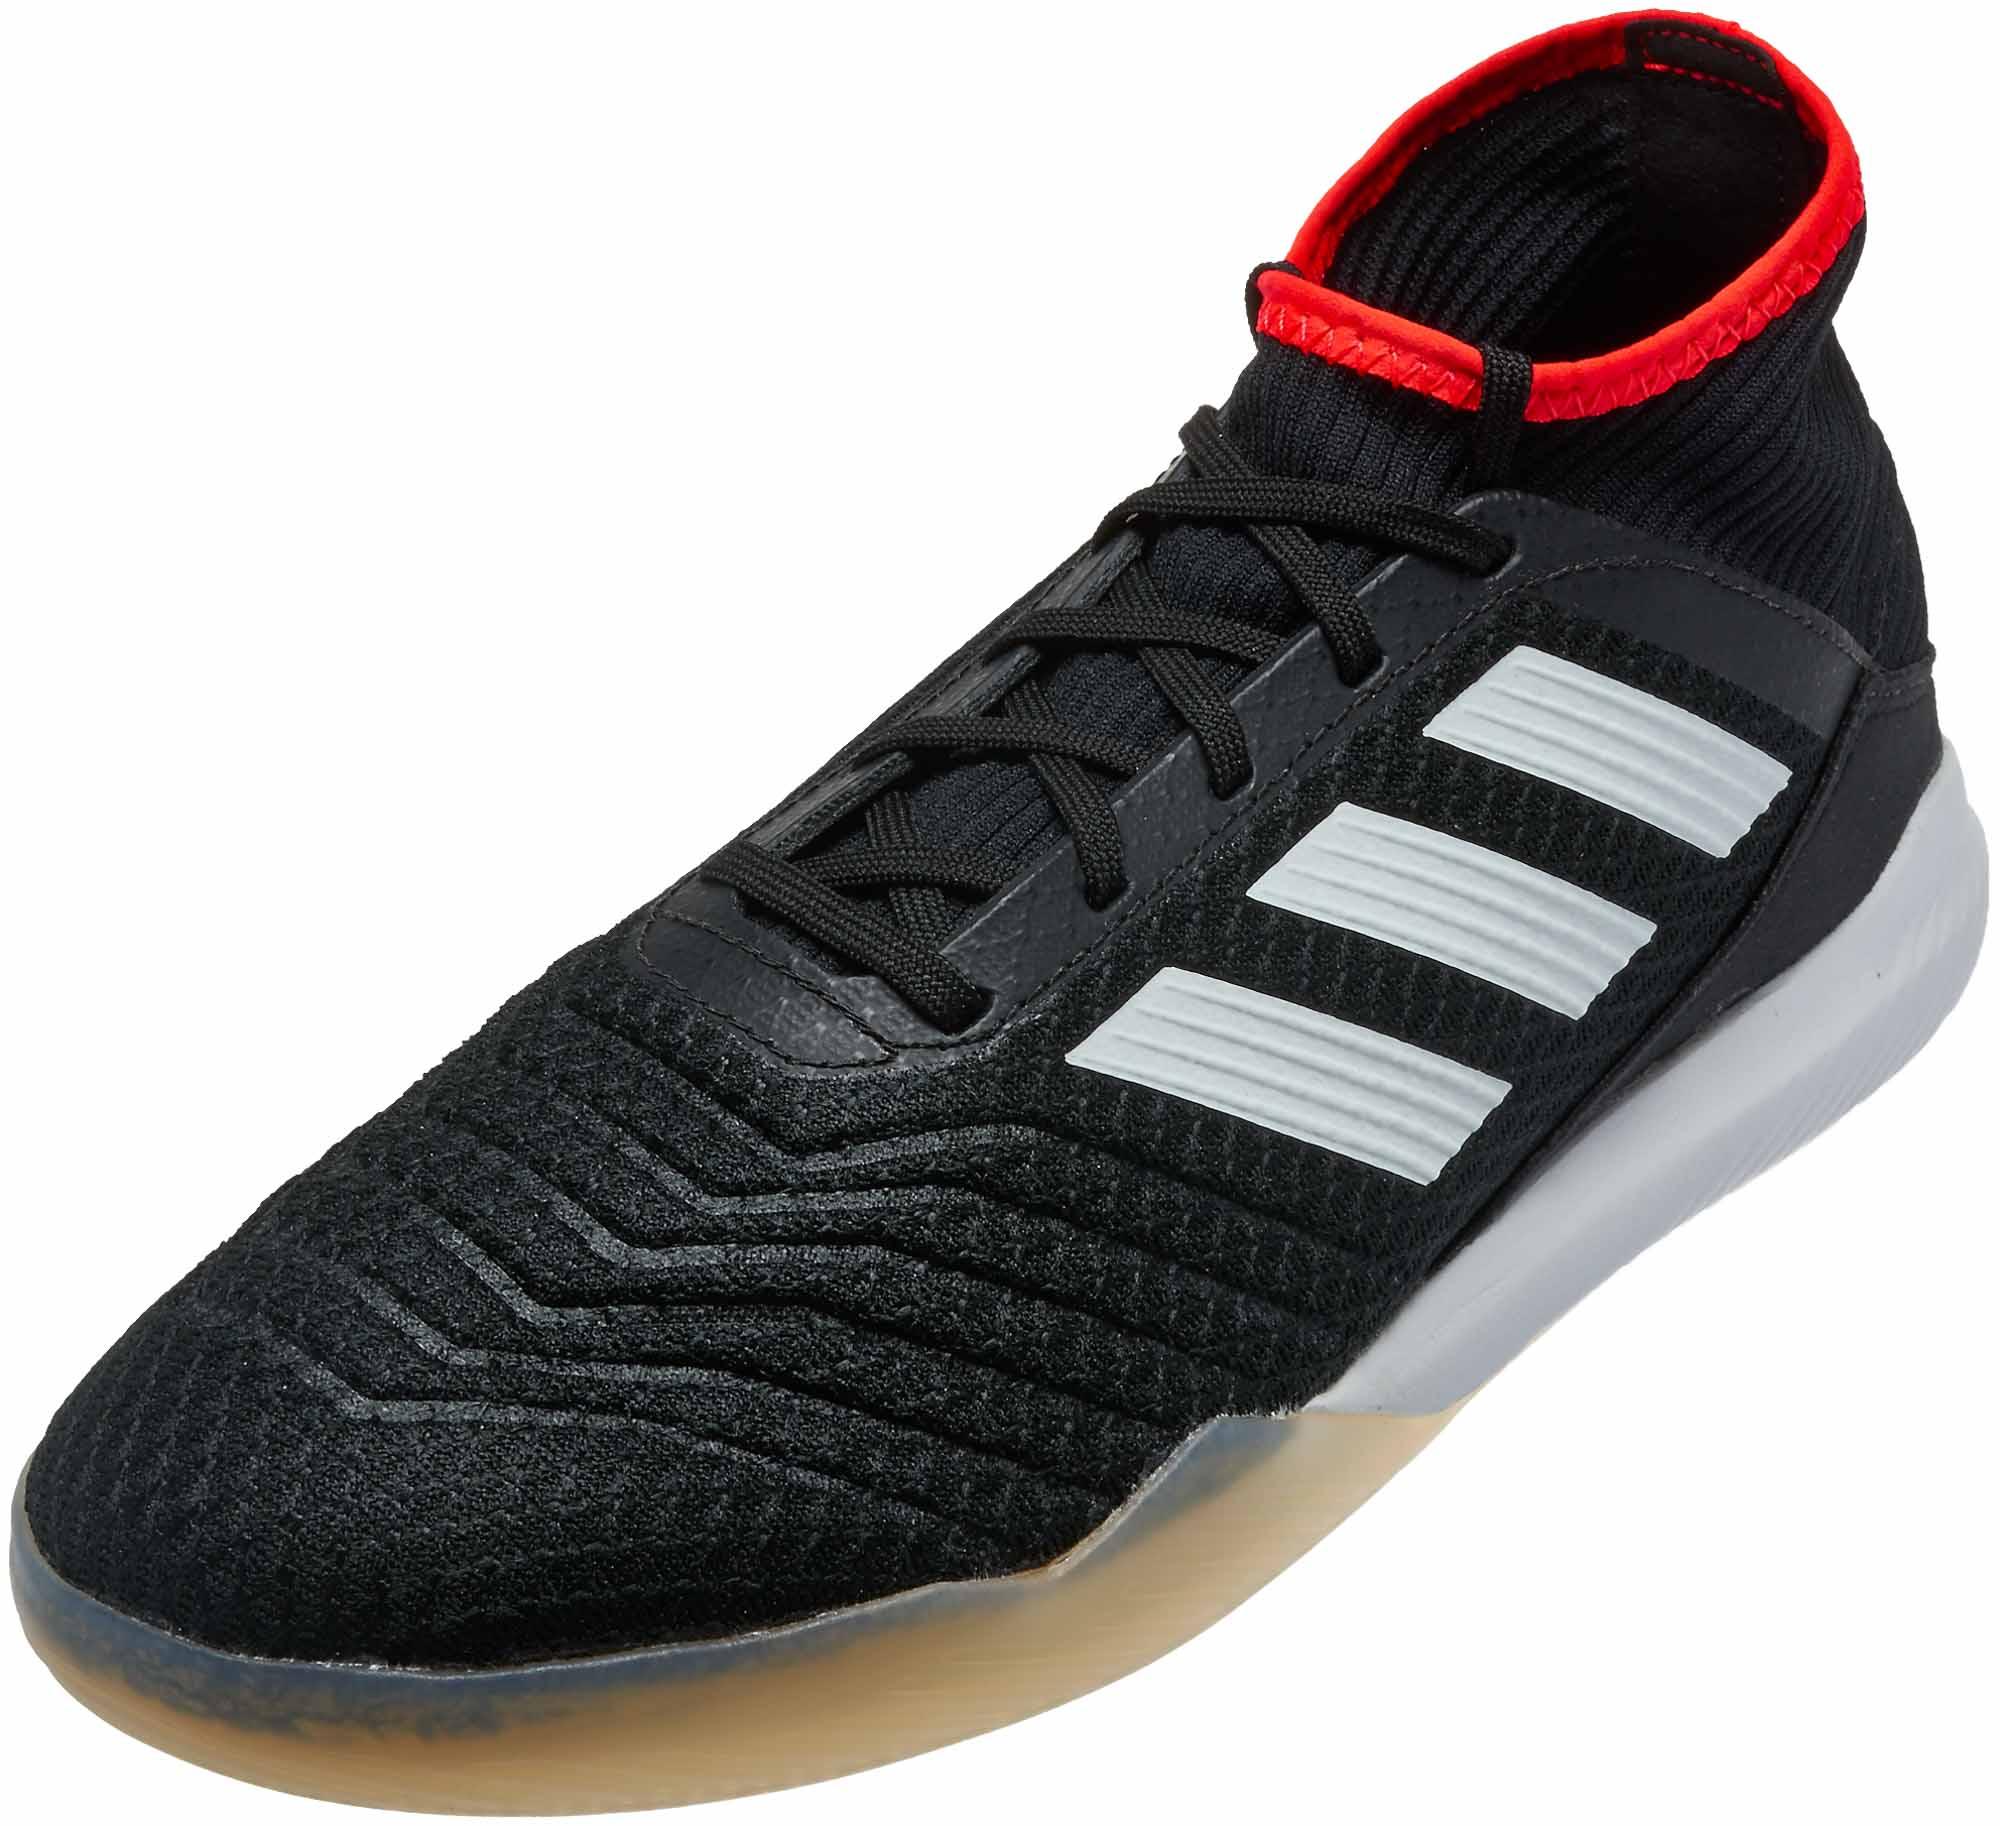 a928f34288380 adidas Predator Tango 18.3 TR - Black   Solar Red